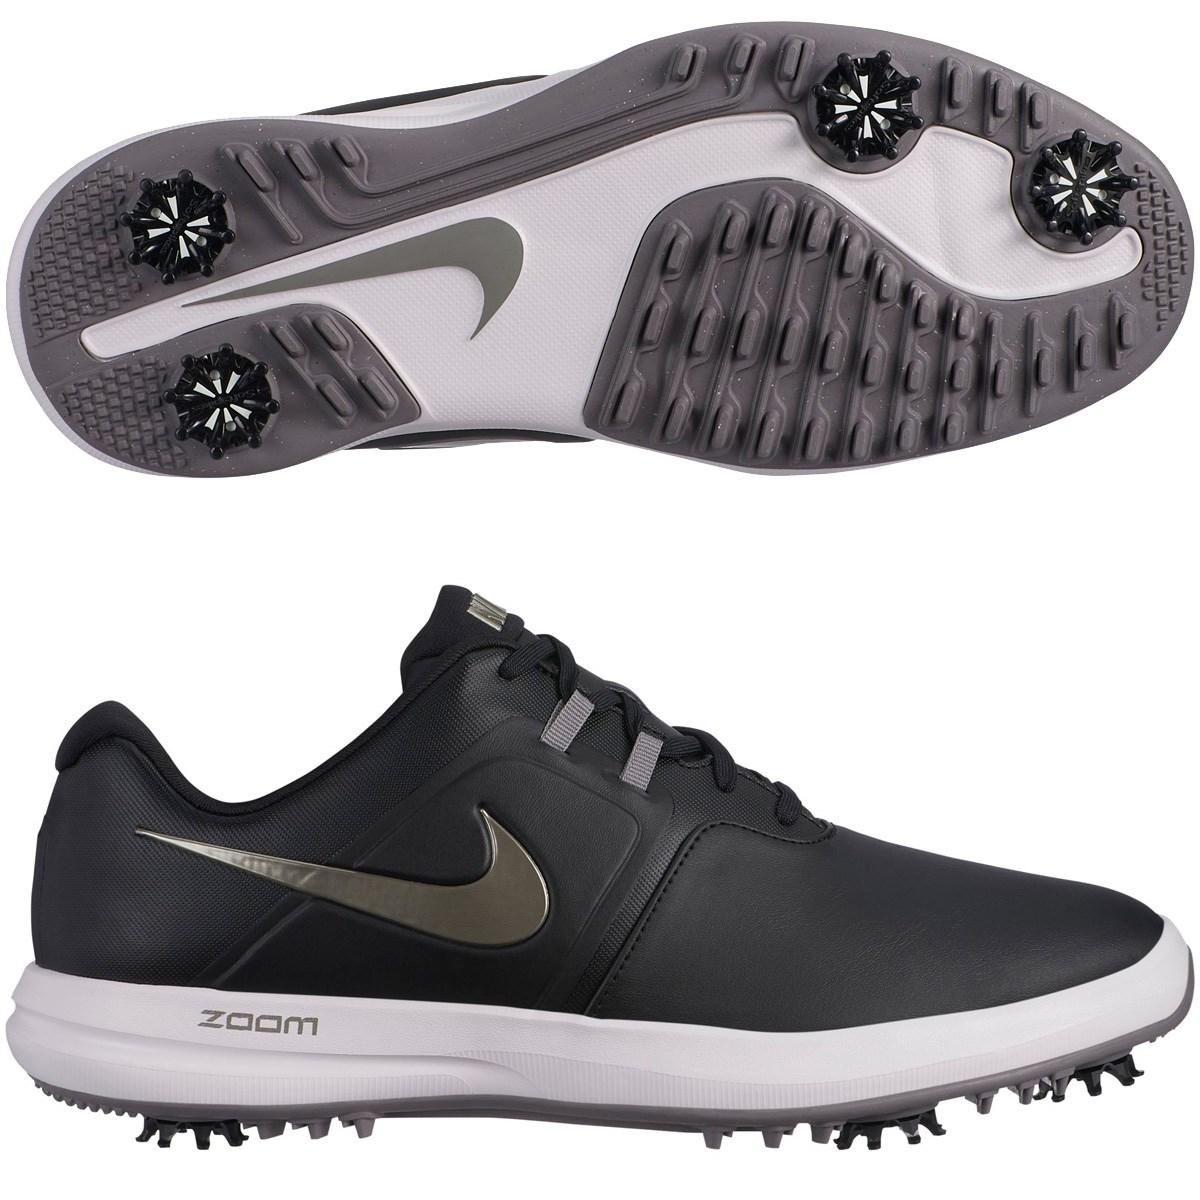 on wholesale better separation shoes エア ズーム ビクトリー シューズ ナイキ NIKE|GDOゴルフショップ